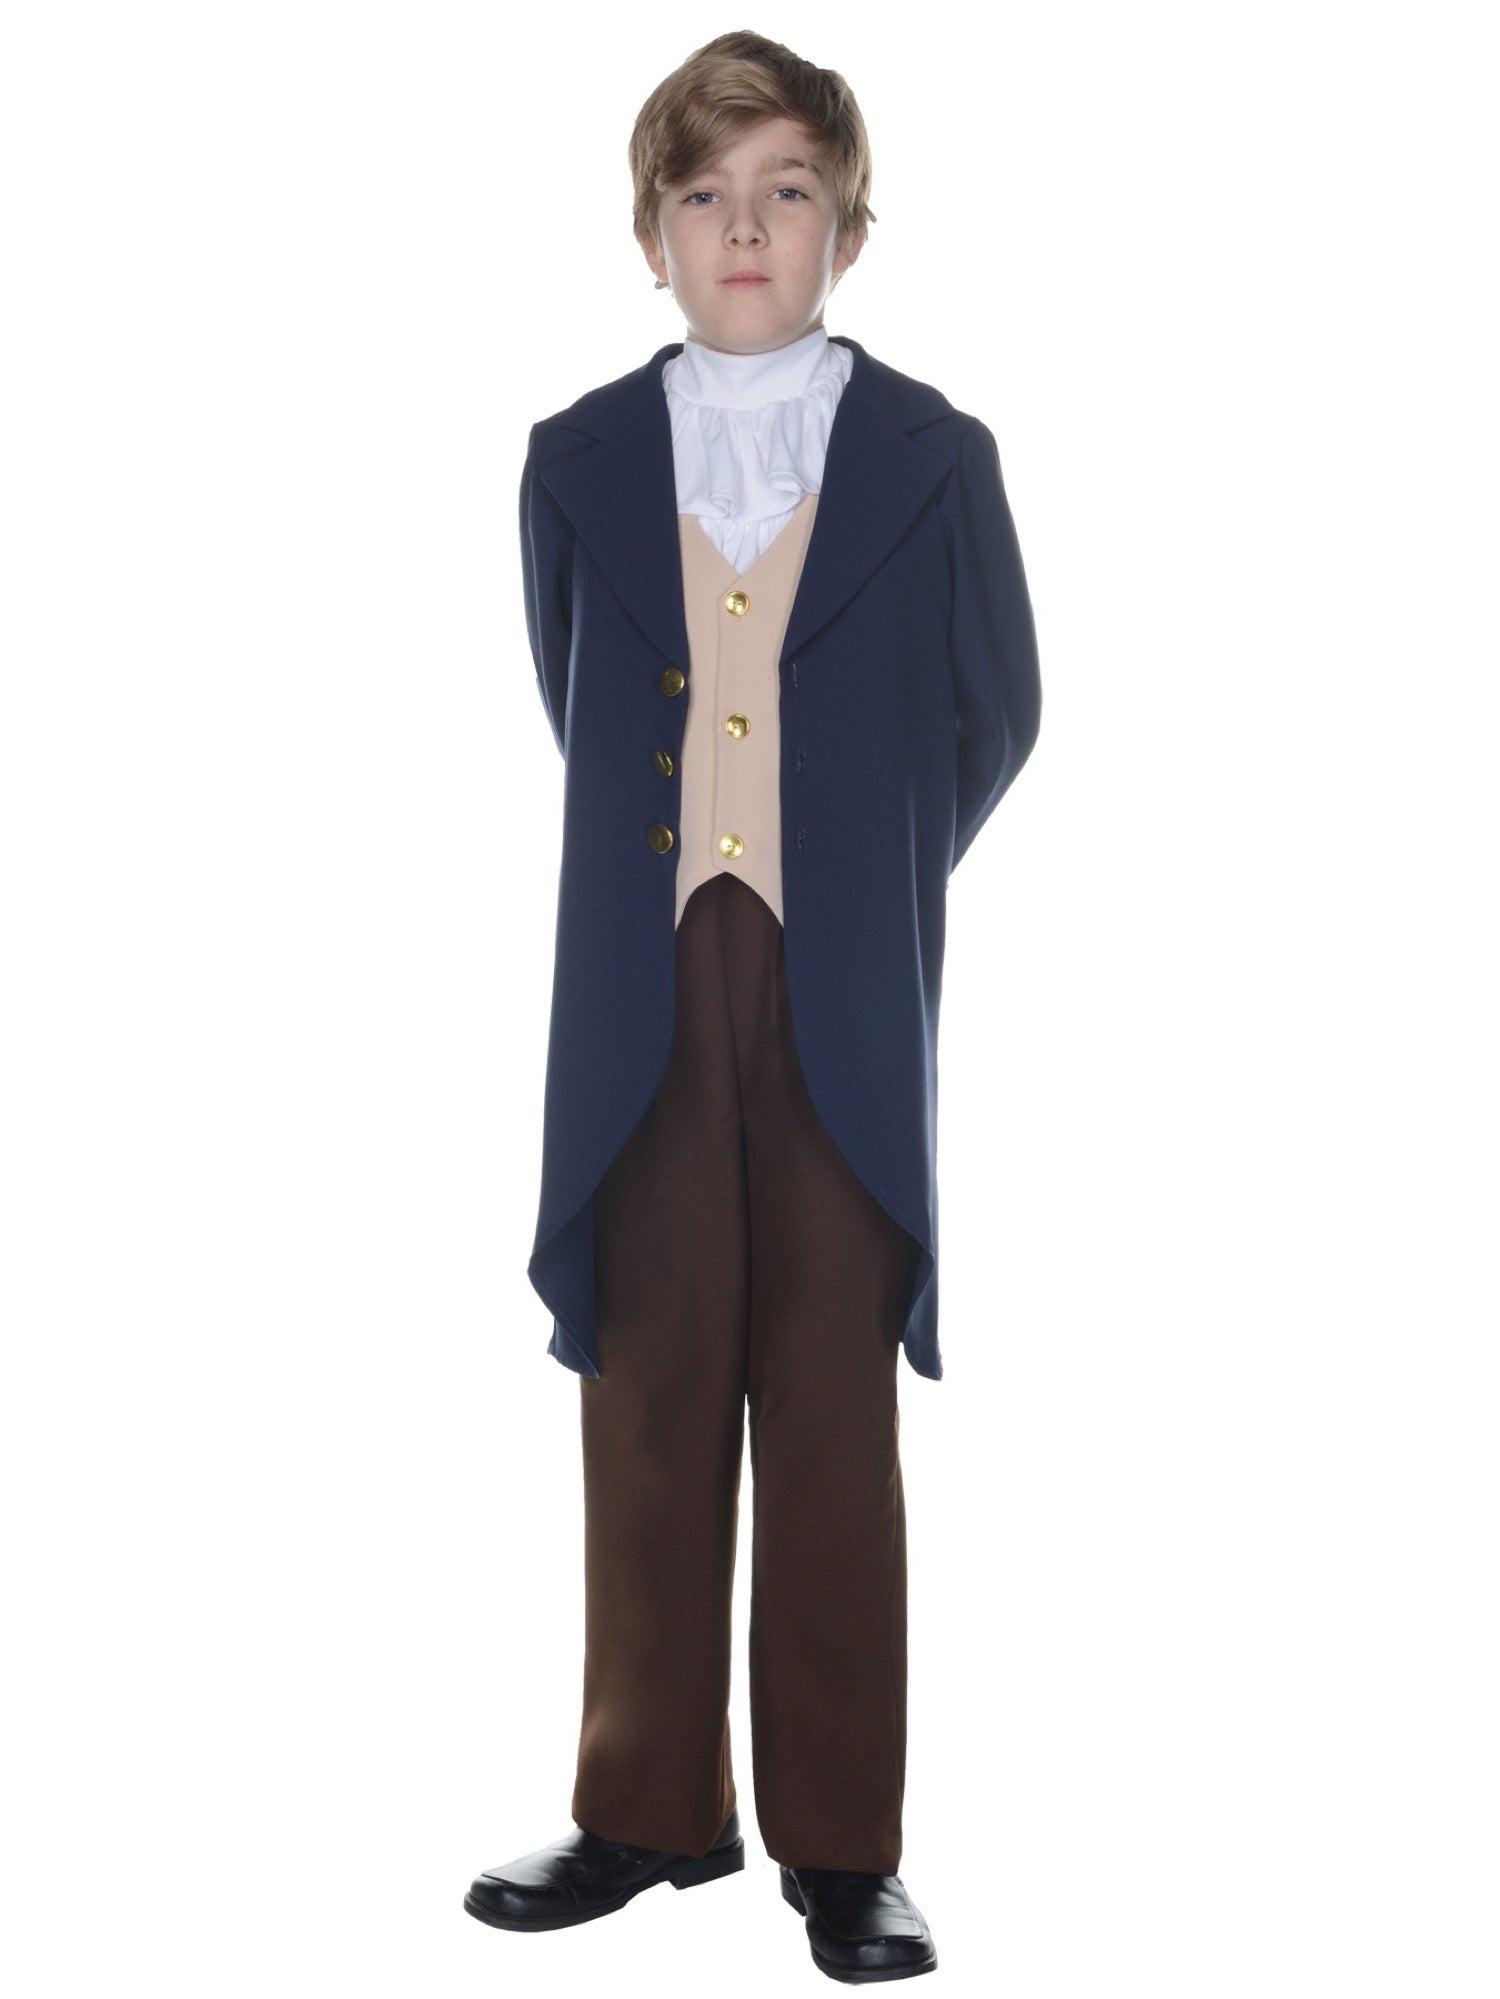 Hobbypos Thomas Jefferson US President Founding Father Colonial Victorian Boys Costume